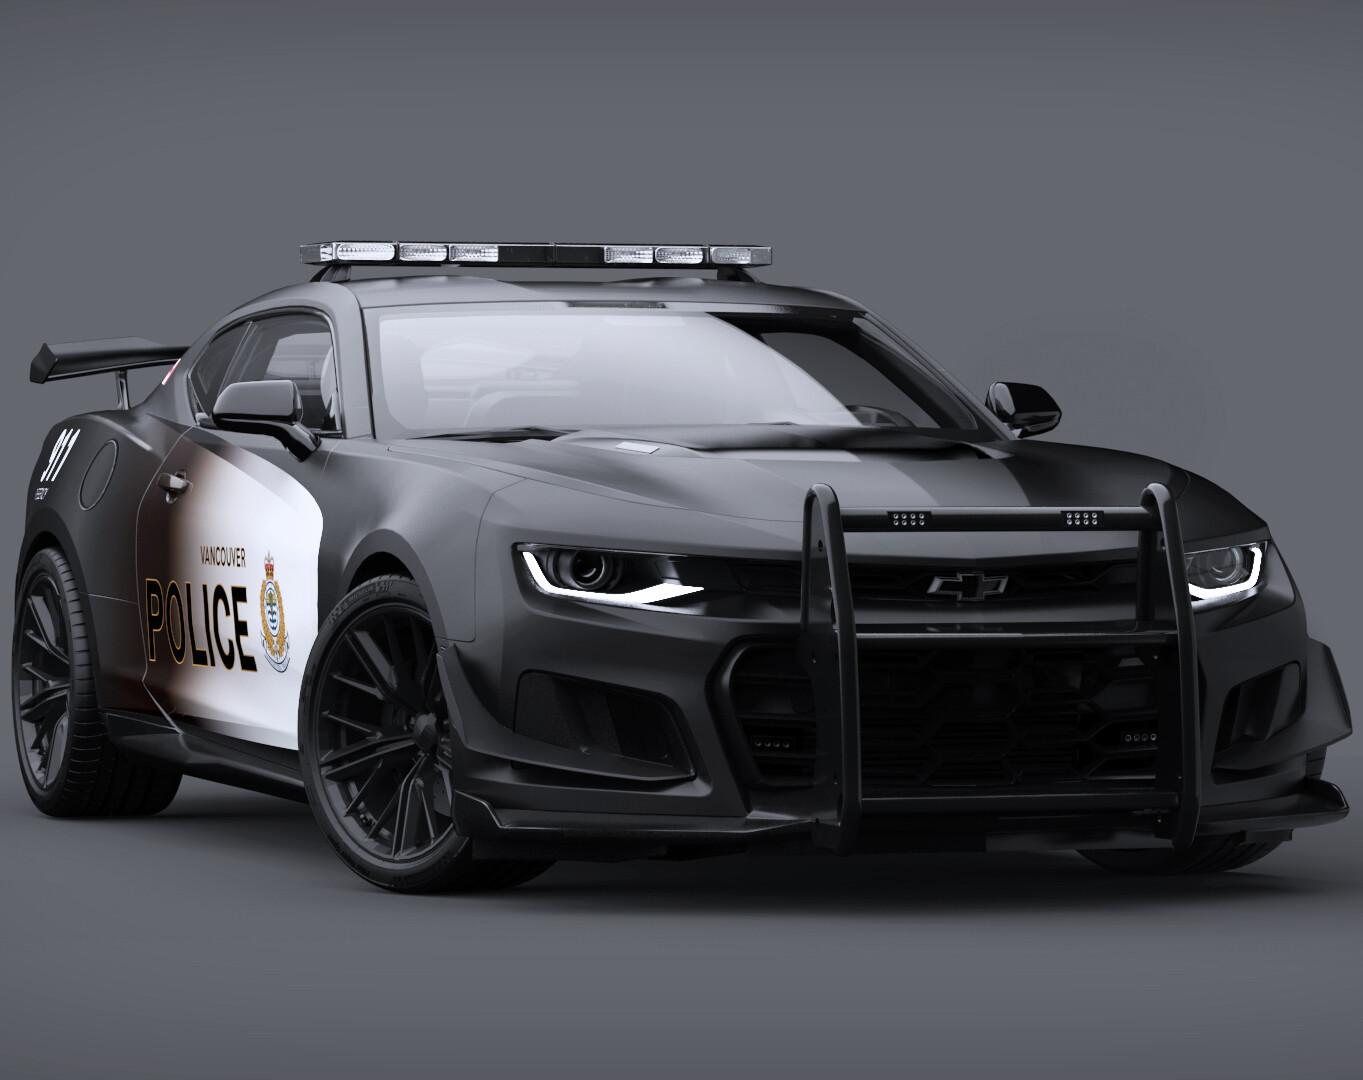 Camaro ZL1 1LE Police Concept